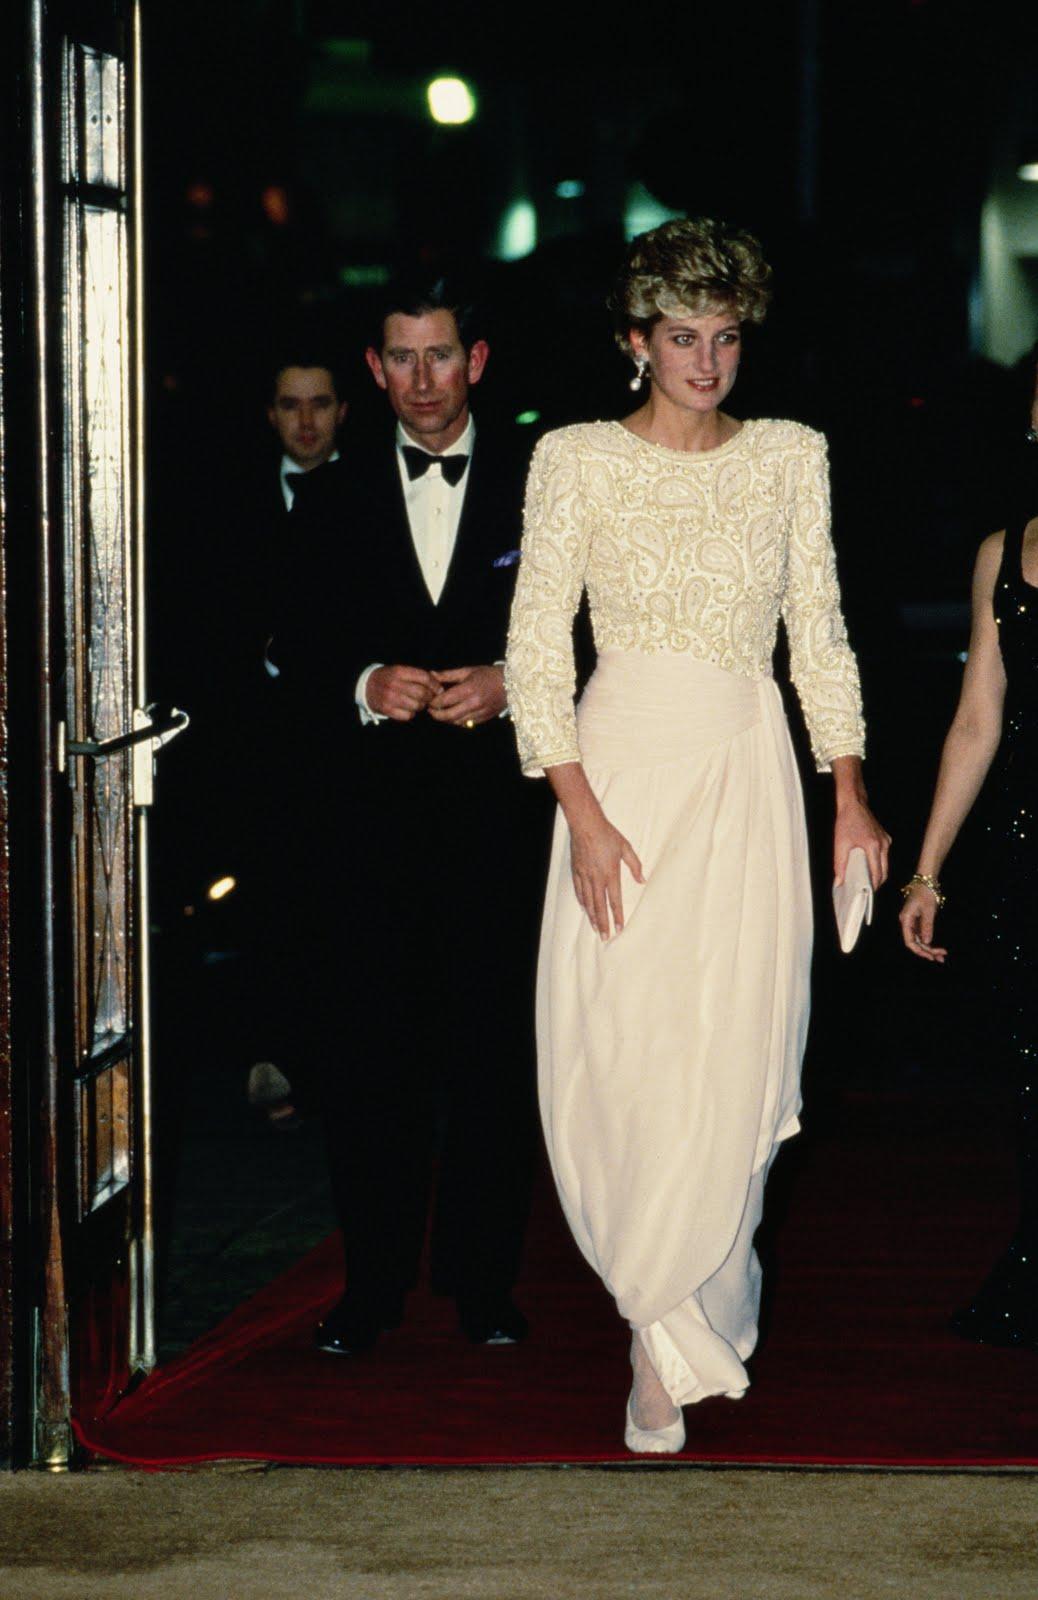 http://1.bp.blogspot.com/-cTSPUoBWWUY/TvpBUWR3T3I/AAAAAAAARg0/JUtpo9dqh_c/s1600/princess_diana_beaded_dress2.jpg